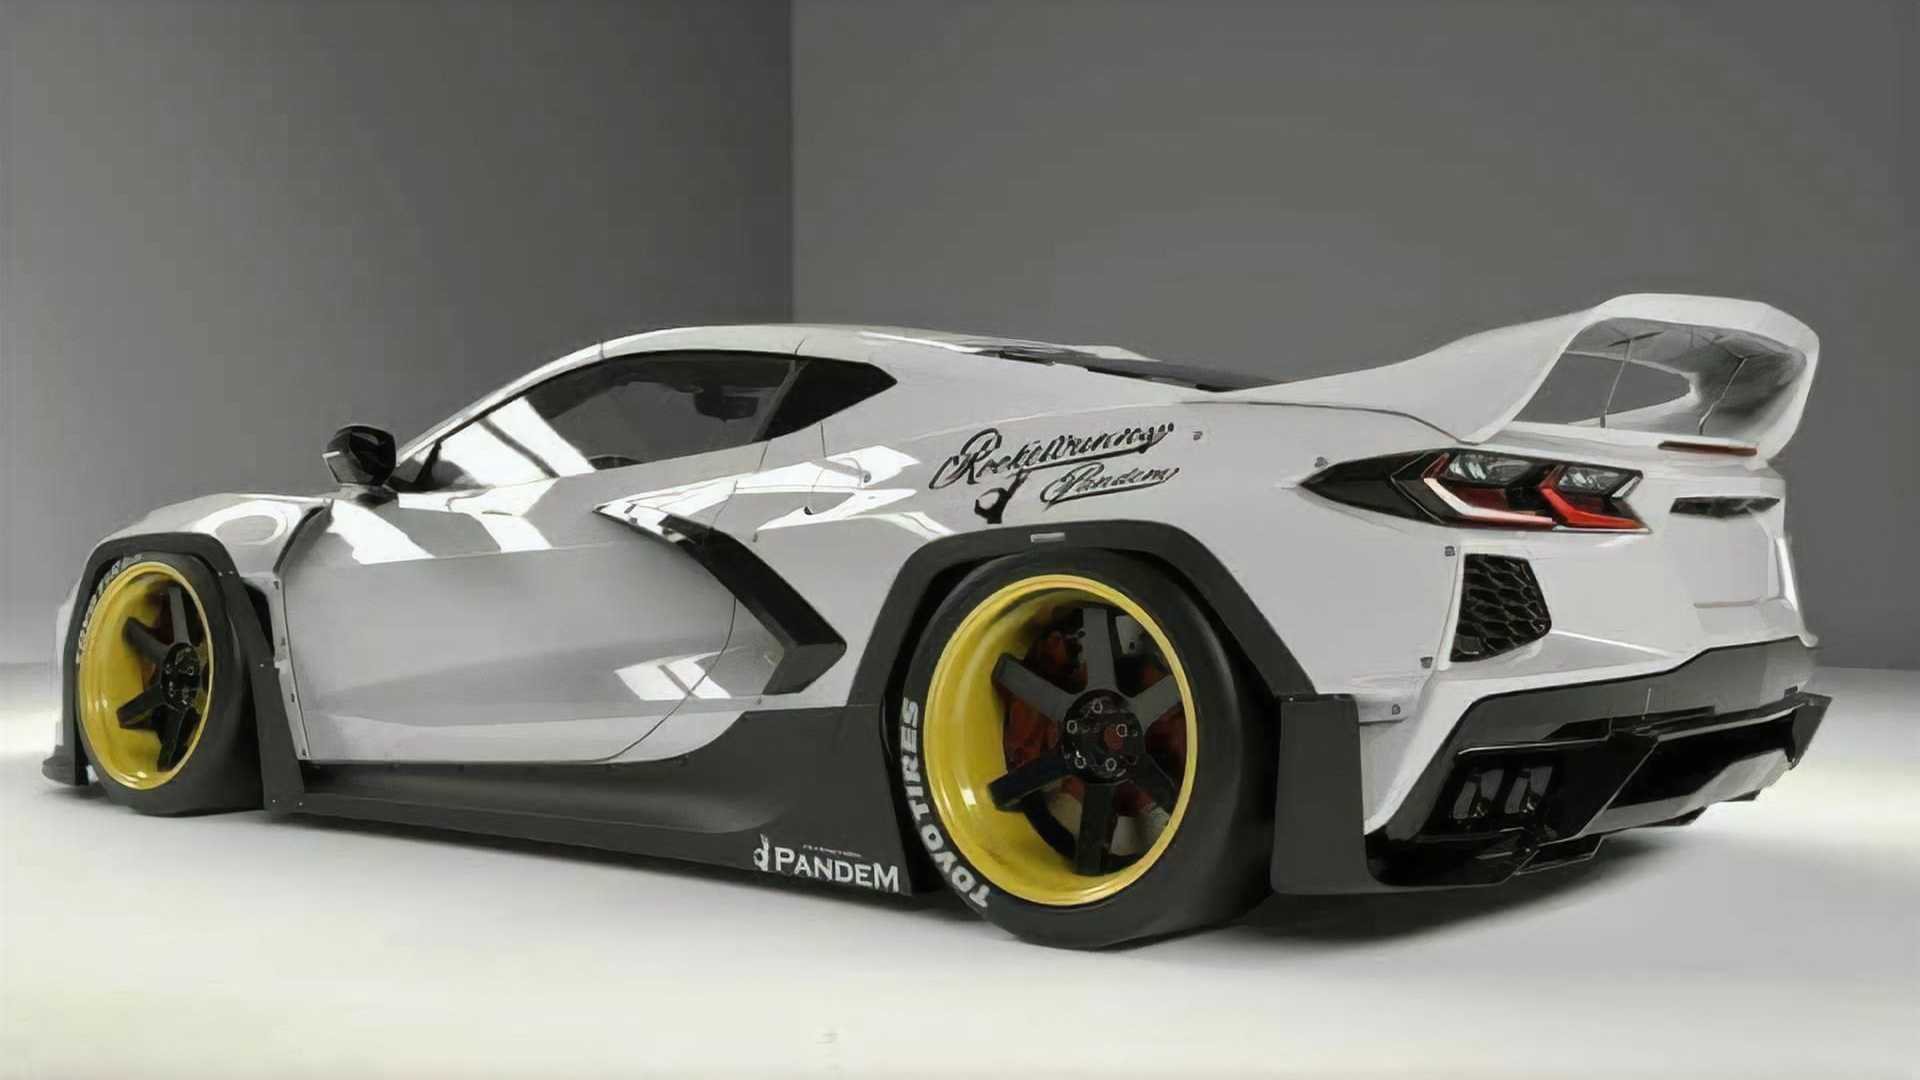 Chevrolet-Corvette-C8-with-Pandem-Rocket-Bunny-bodykit-4